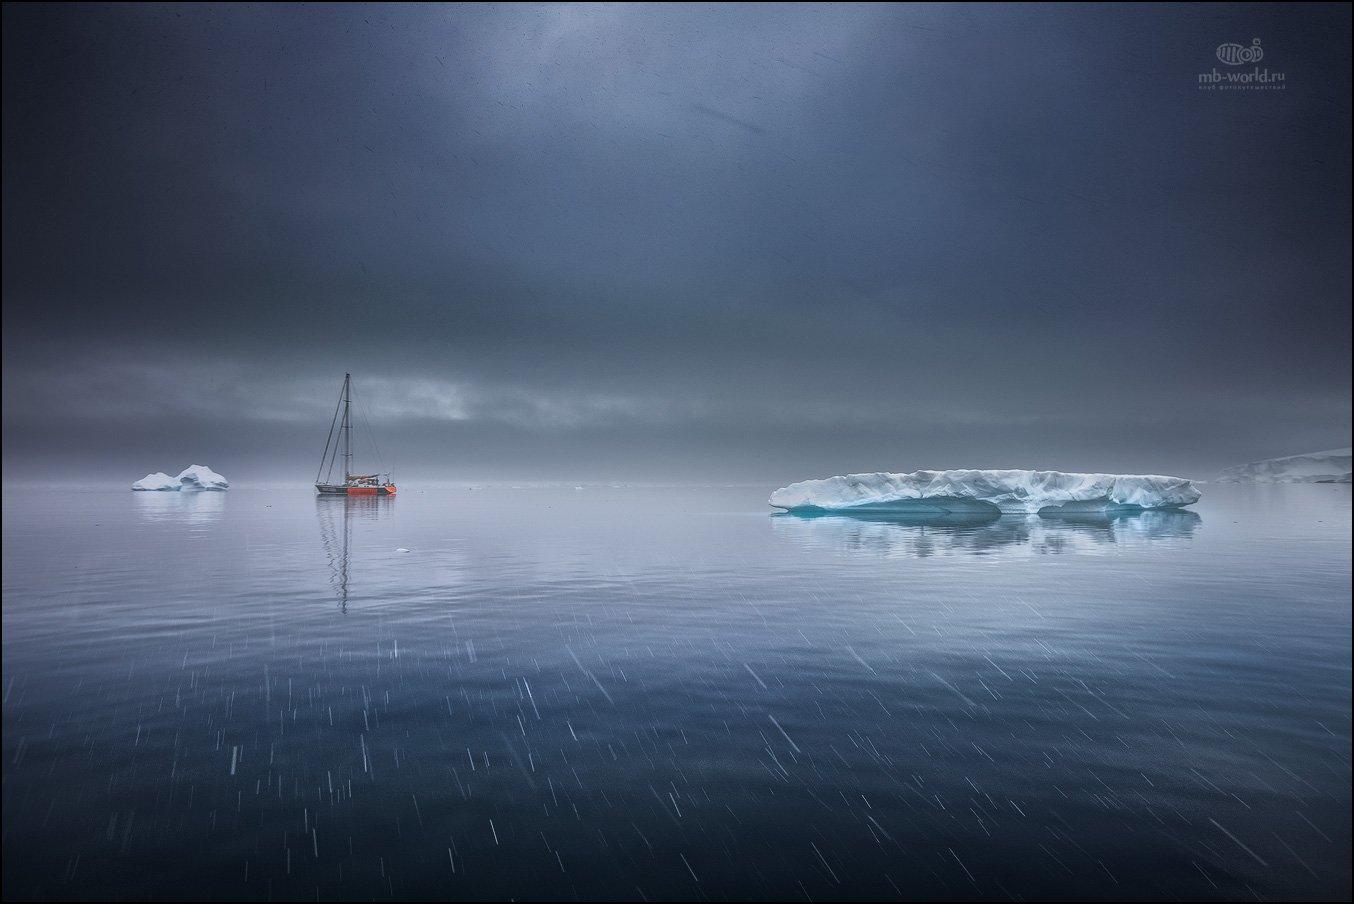 Антарктида, лед, айсберг, пейзаж, Mikhail vorobyev